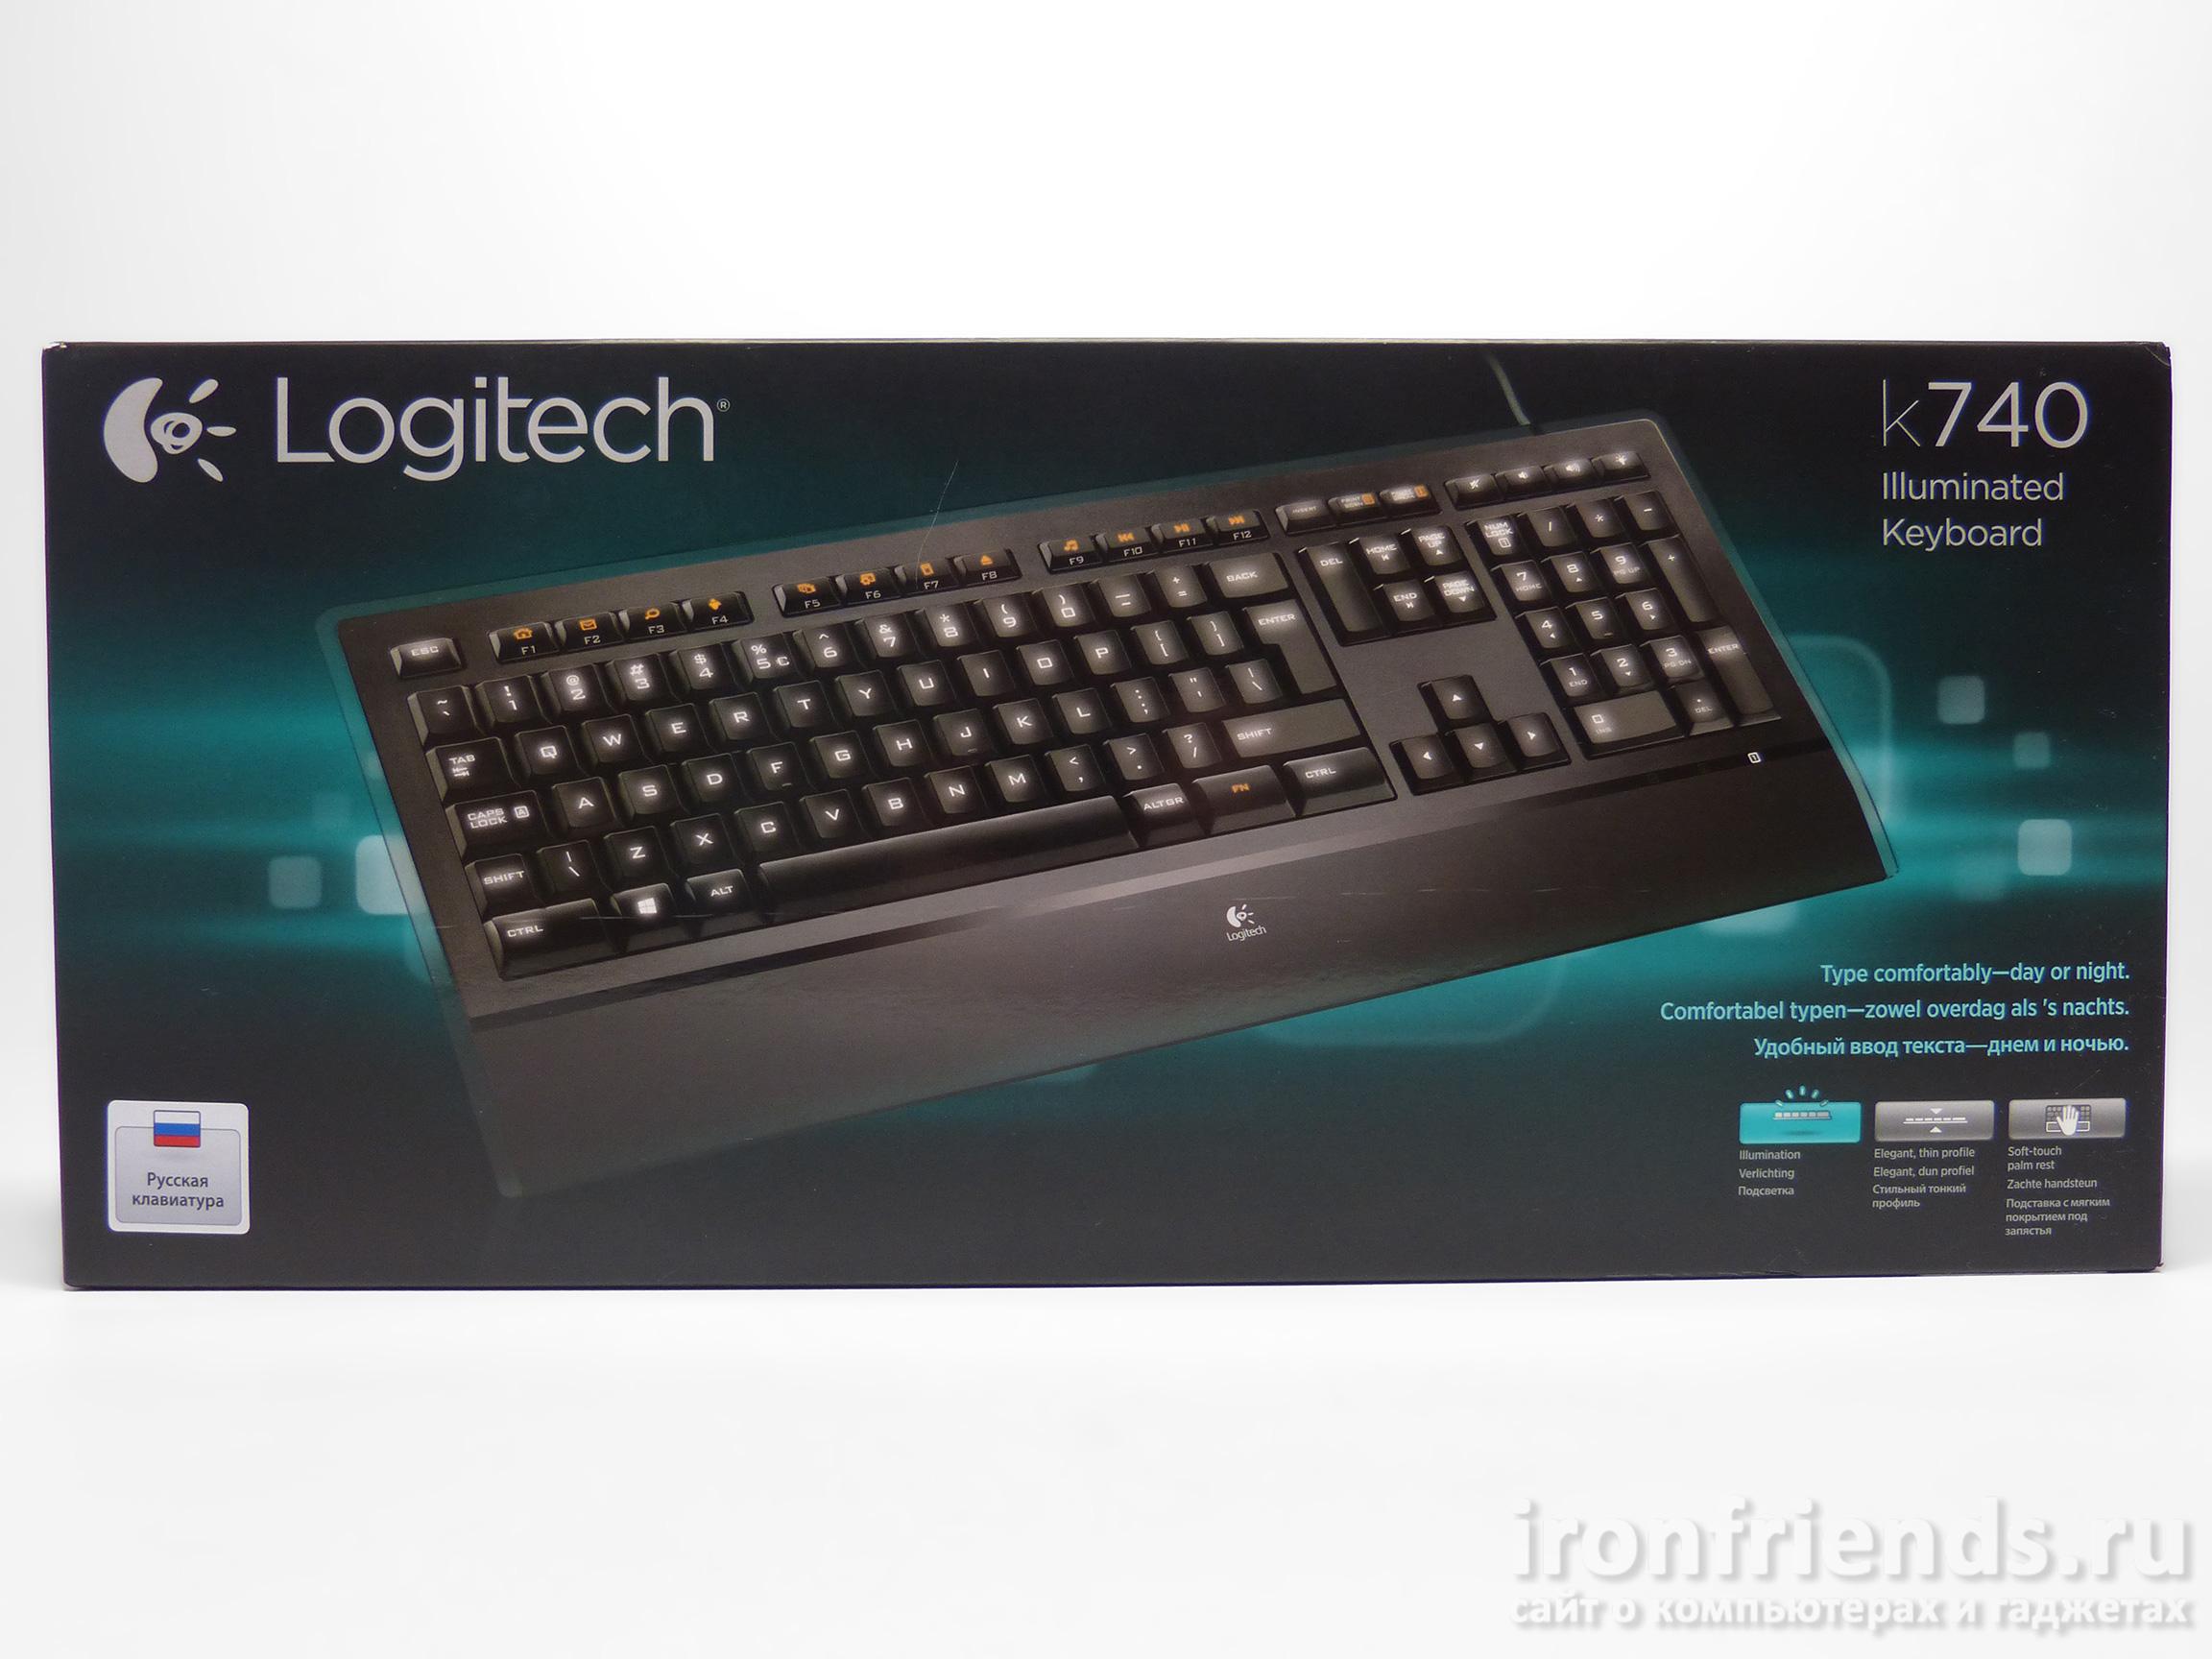 Упаковка Logitech K740 illuminated